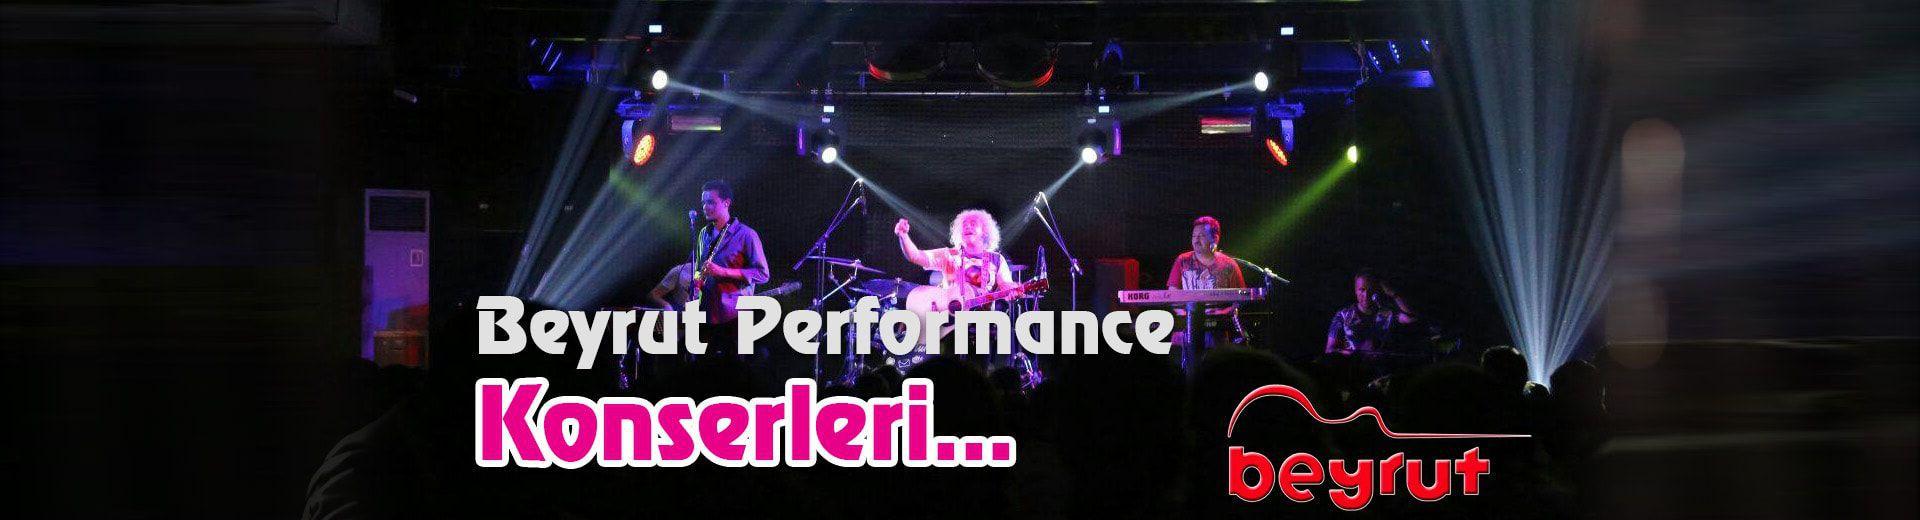 Kartal Beyrut Performance Konserleri